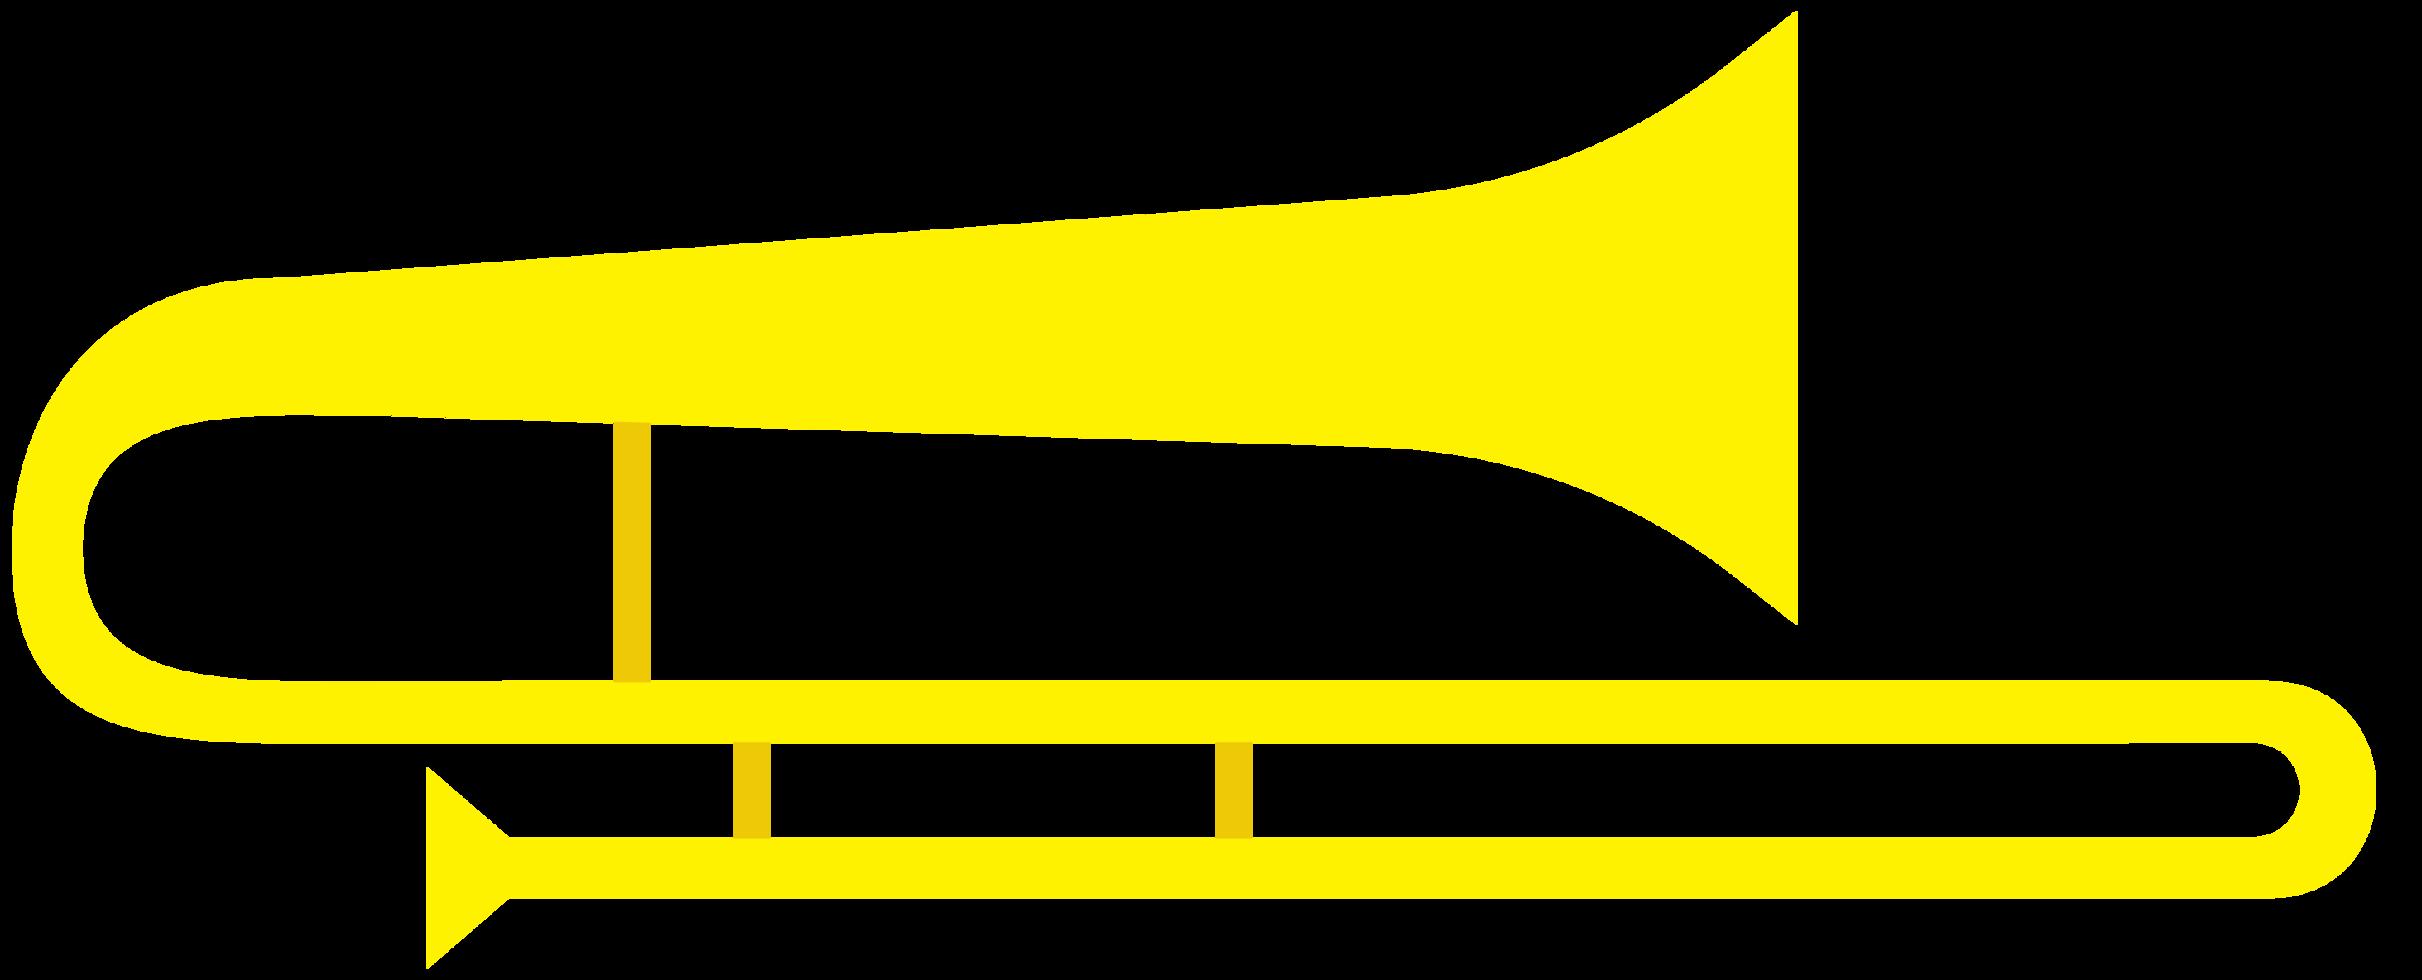 muziek blaasinstrument trombone png